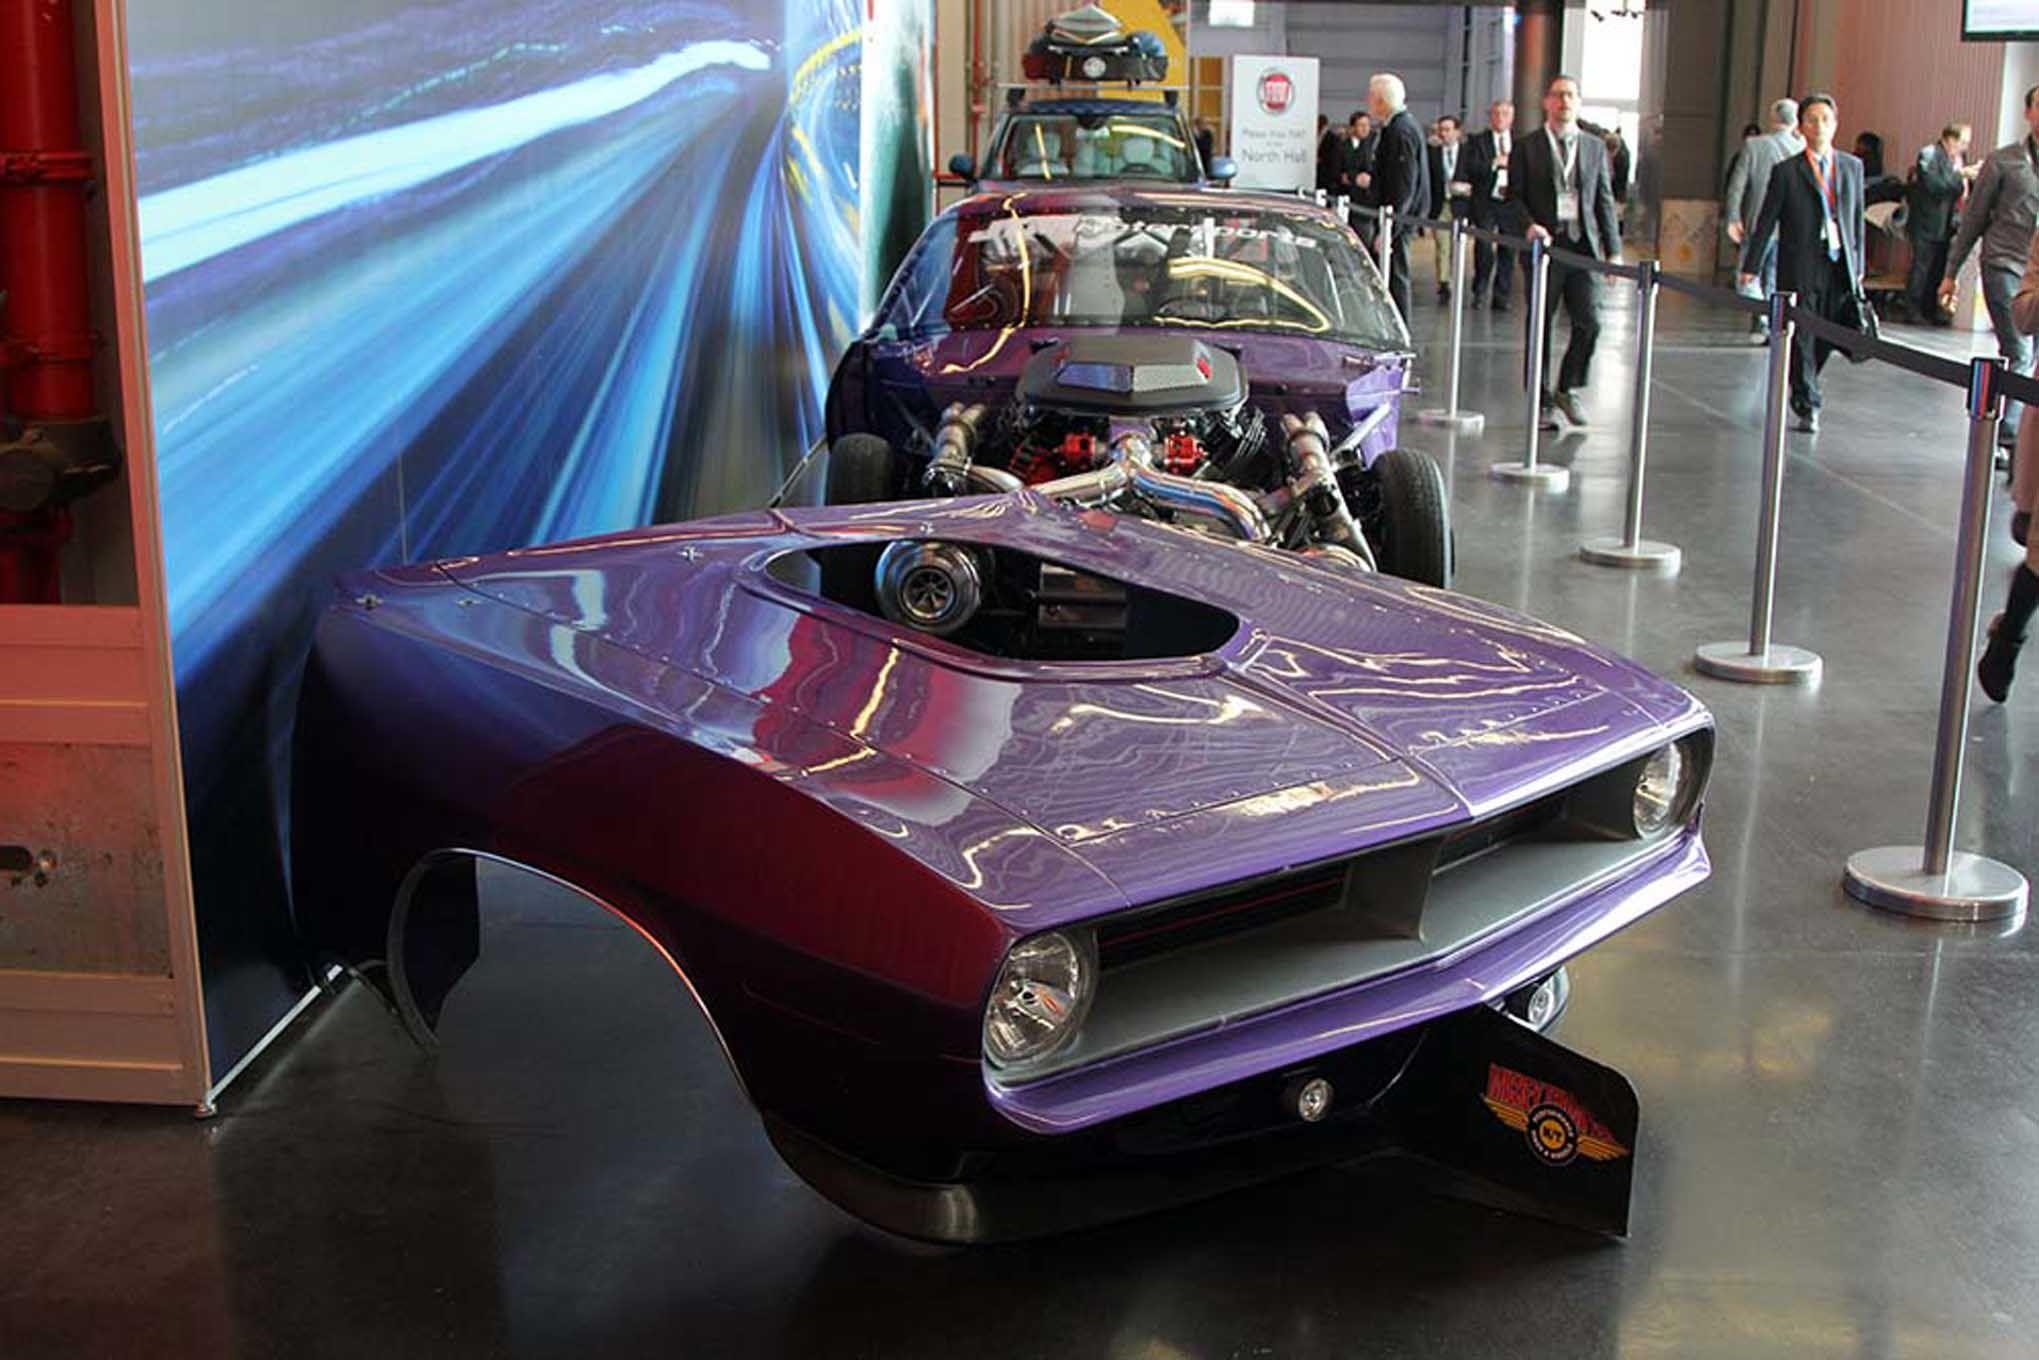 JTM Motorsports-built 1970 twin-turbo Hemi \'Cuda drag car. The ...